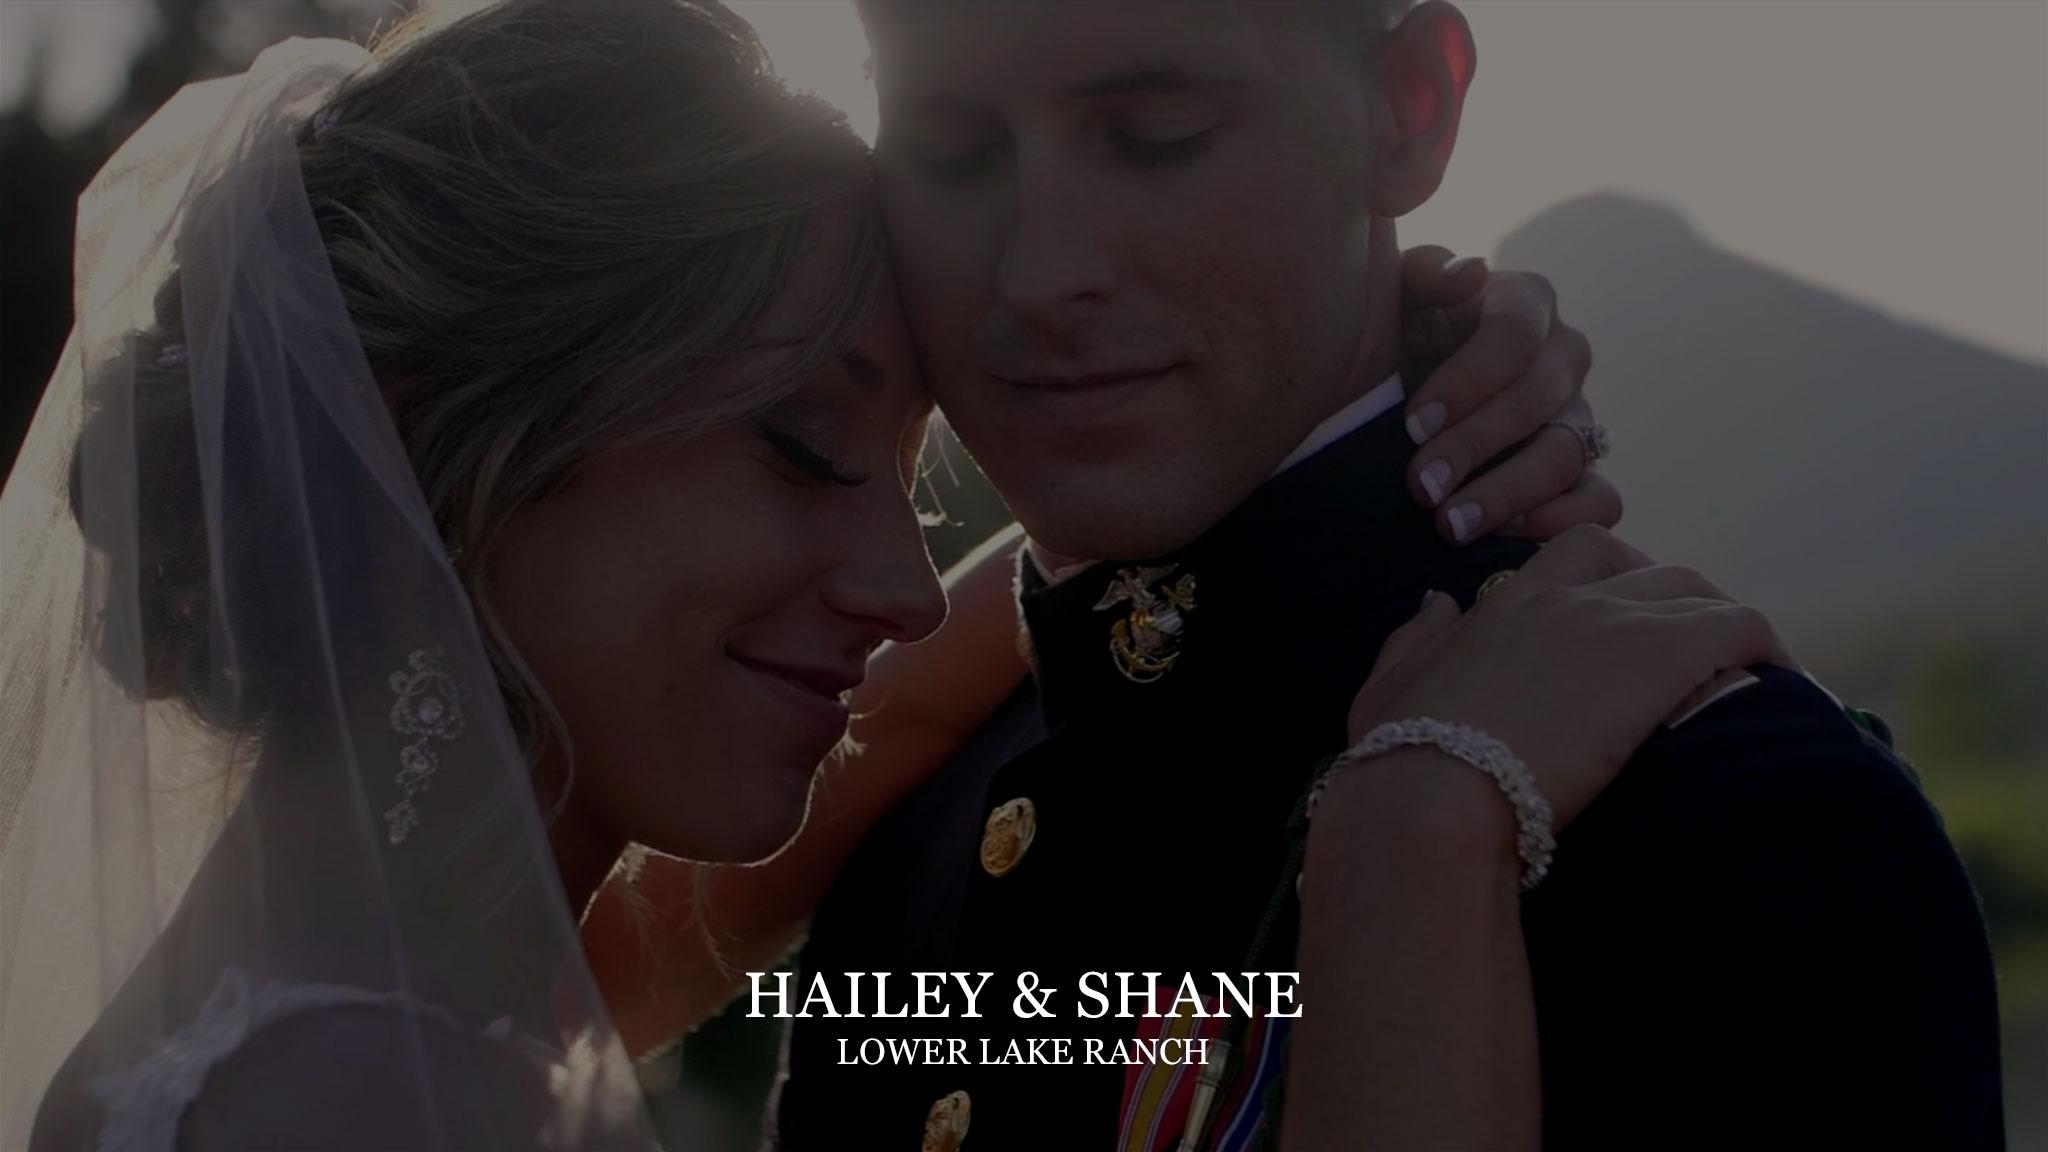 Hailey & Shane at Lower Lake Ranch